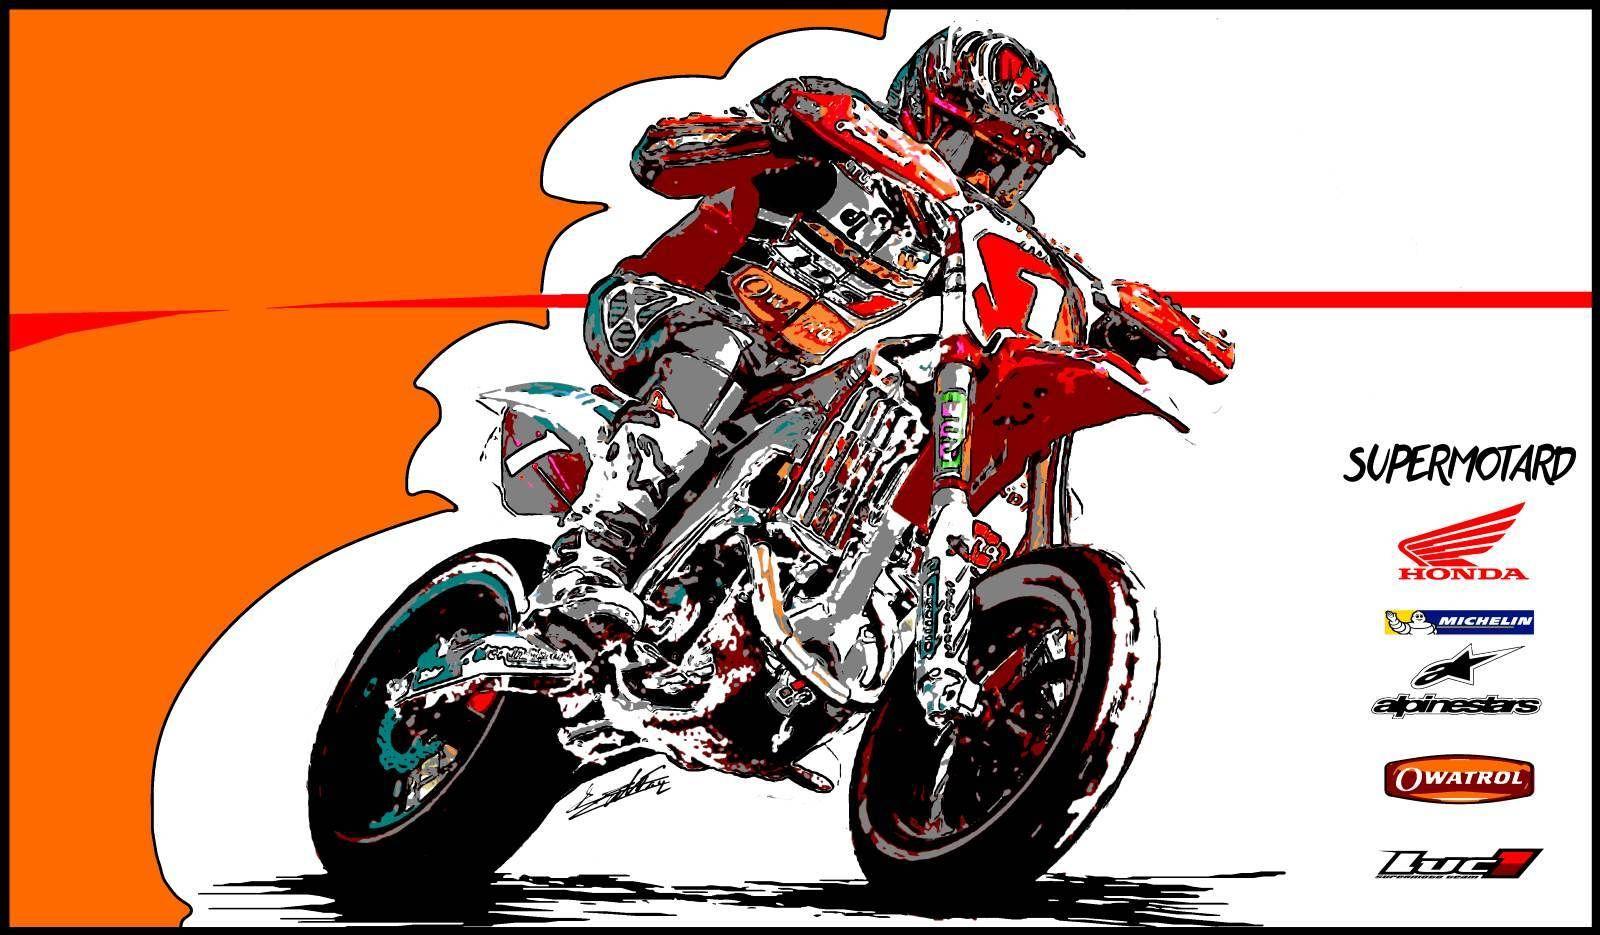 Tableau moto supermotard dessin supermoto acrylique main - Dessin de motard ...